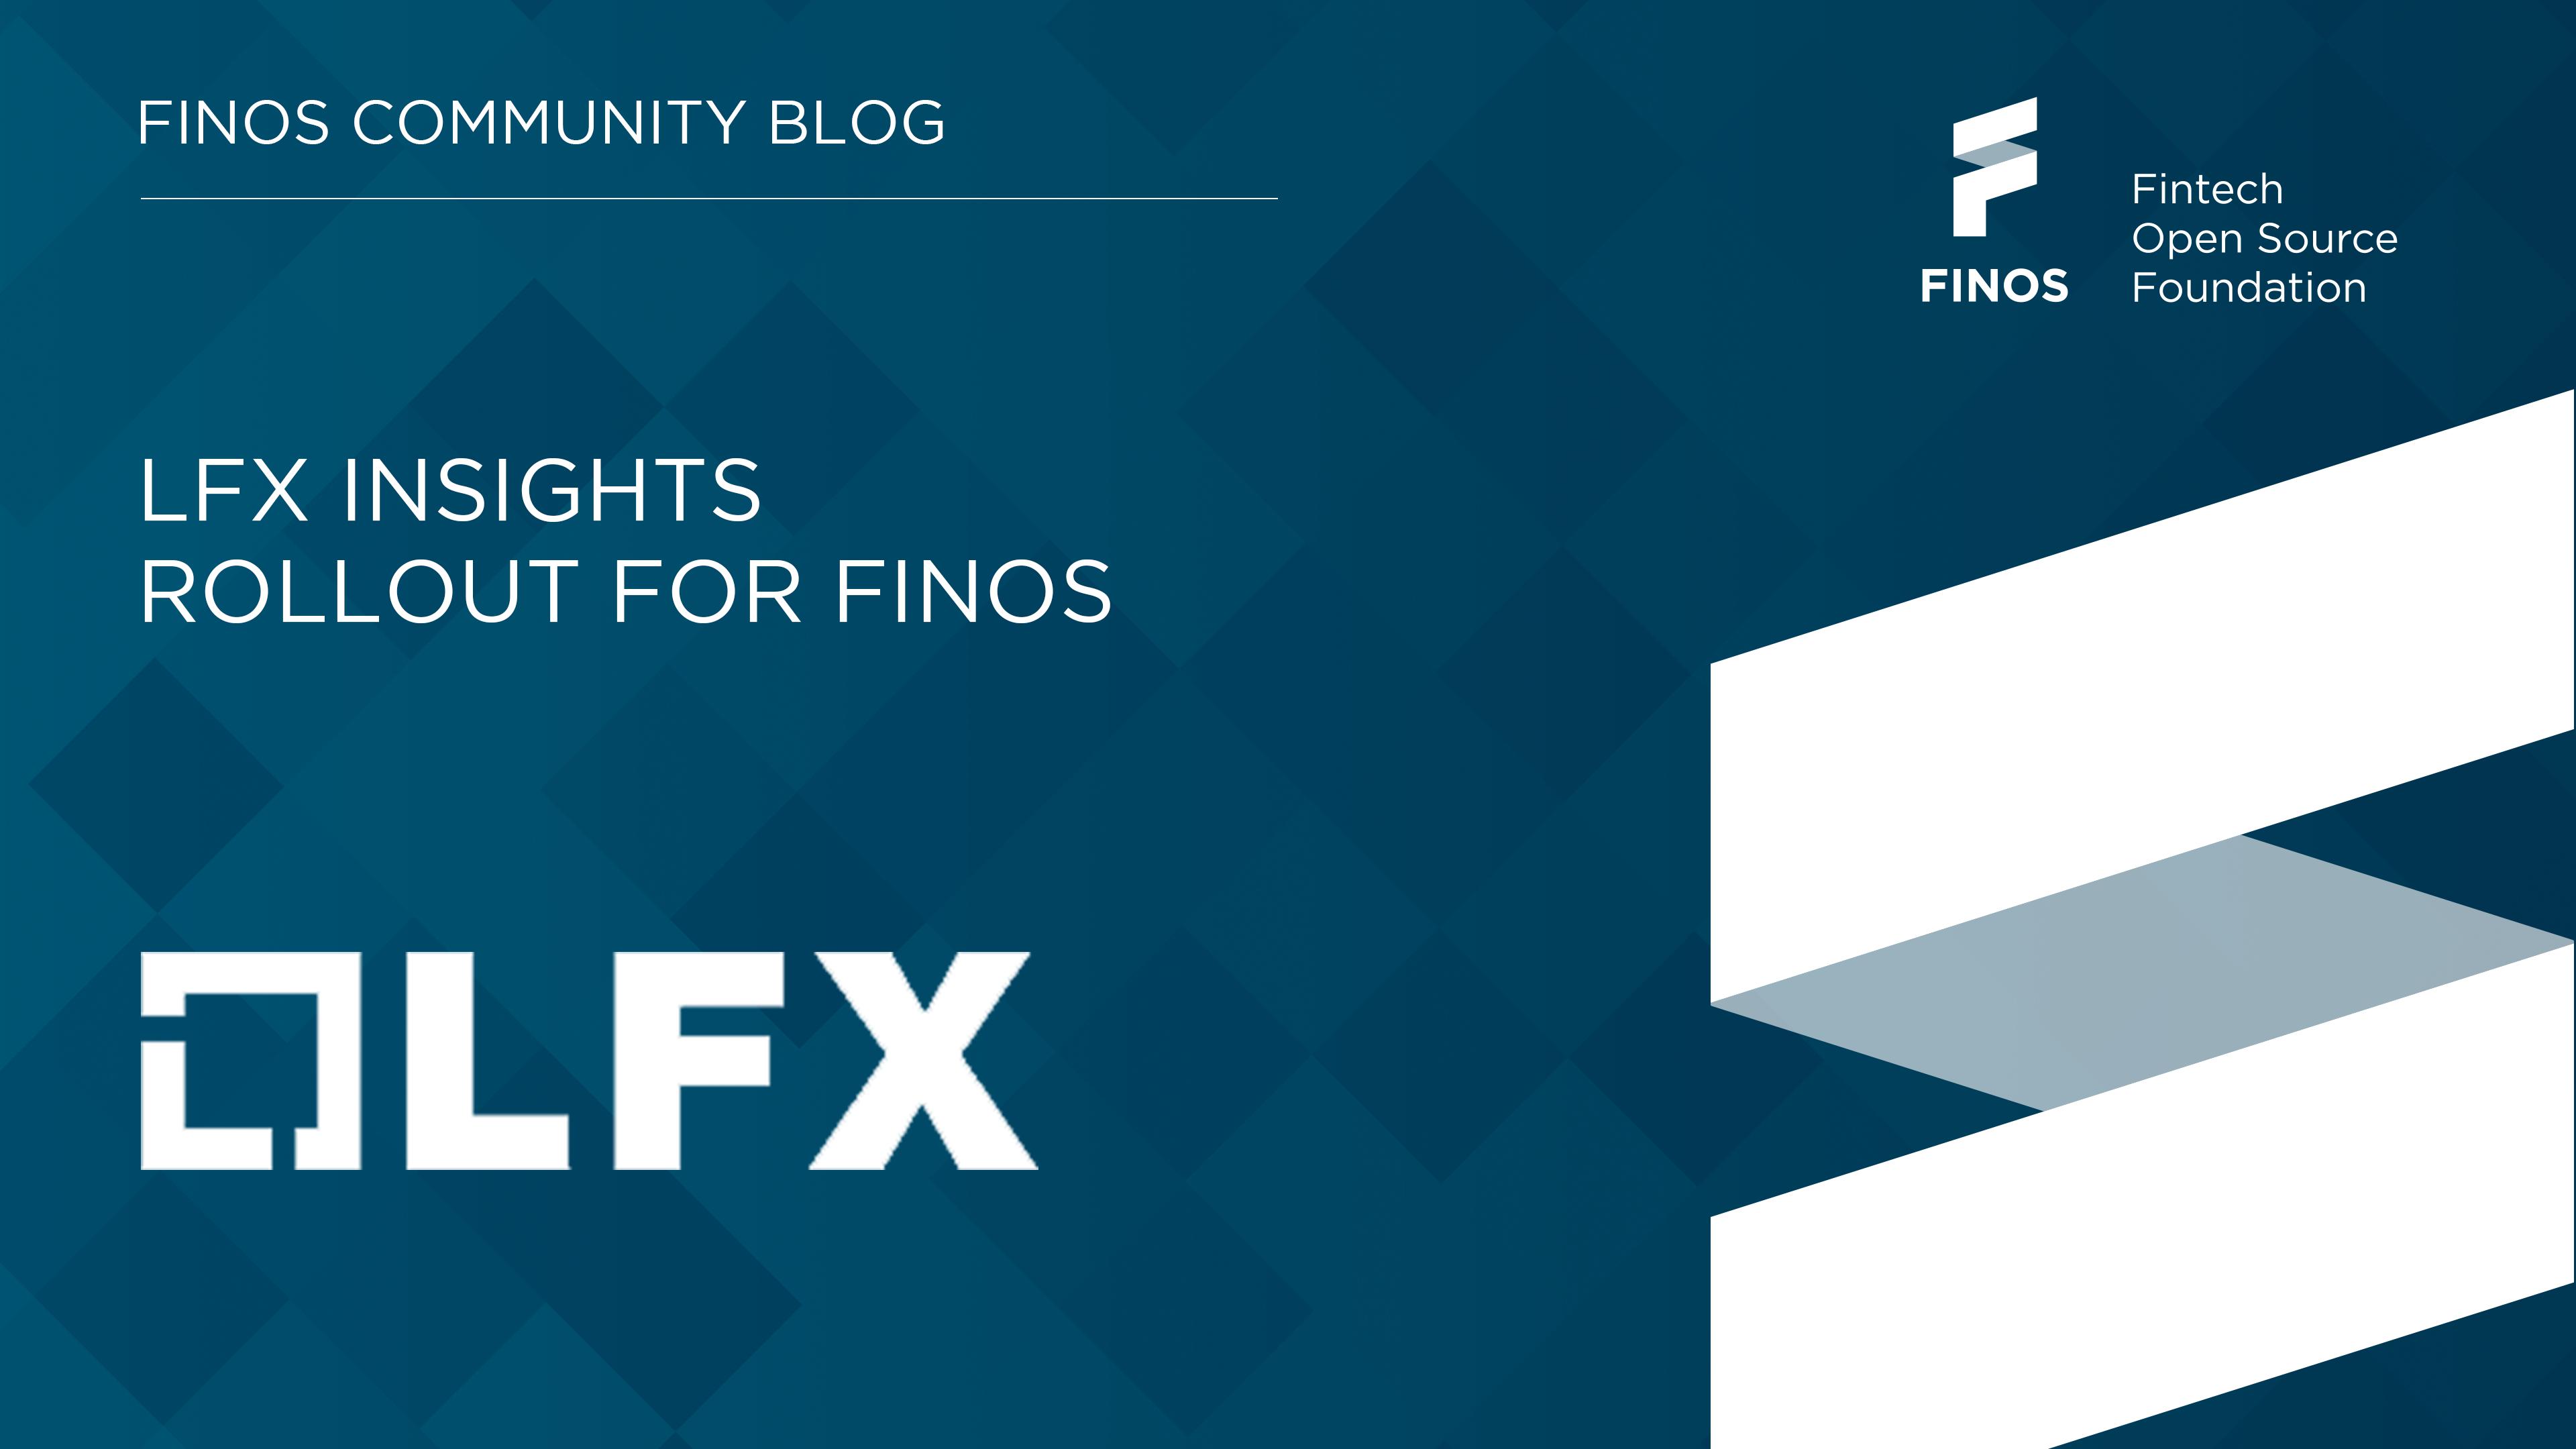 lfx-insights-rollout-for-finos